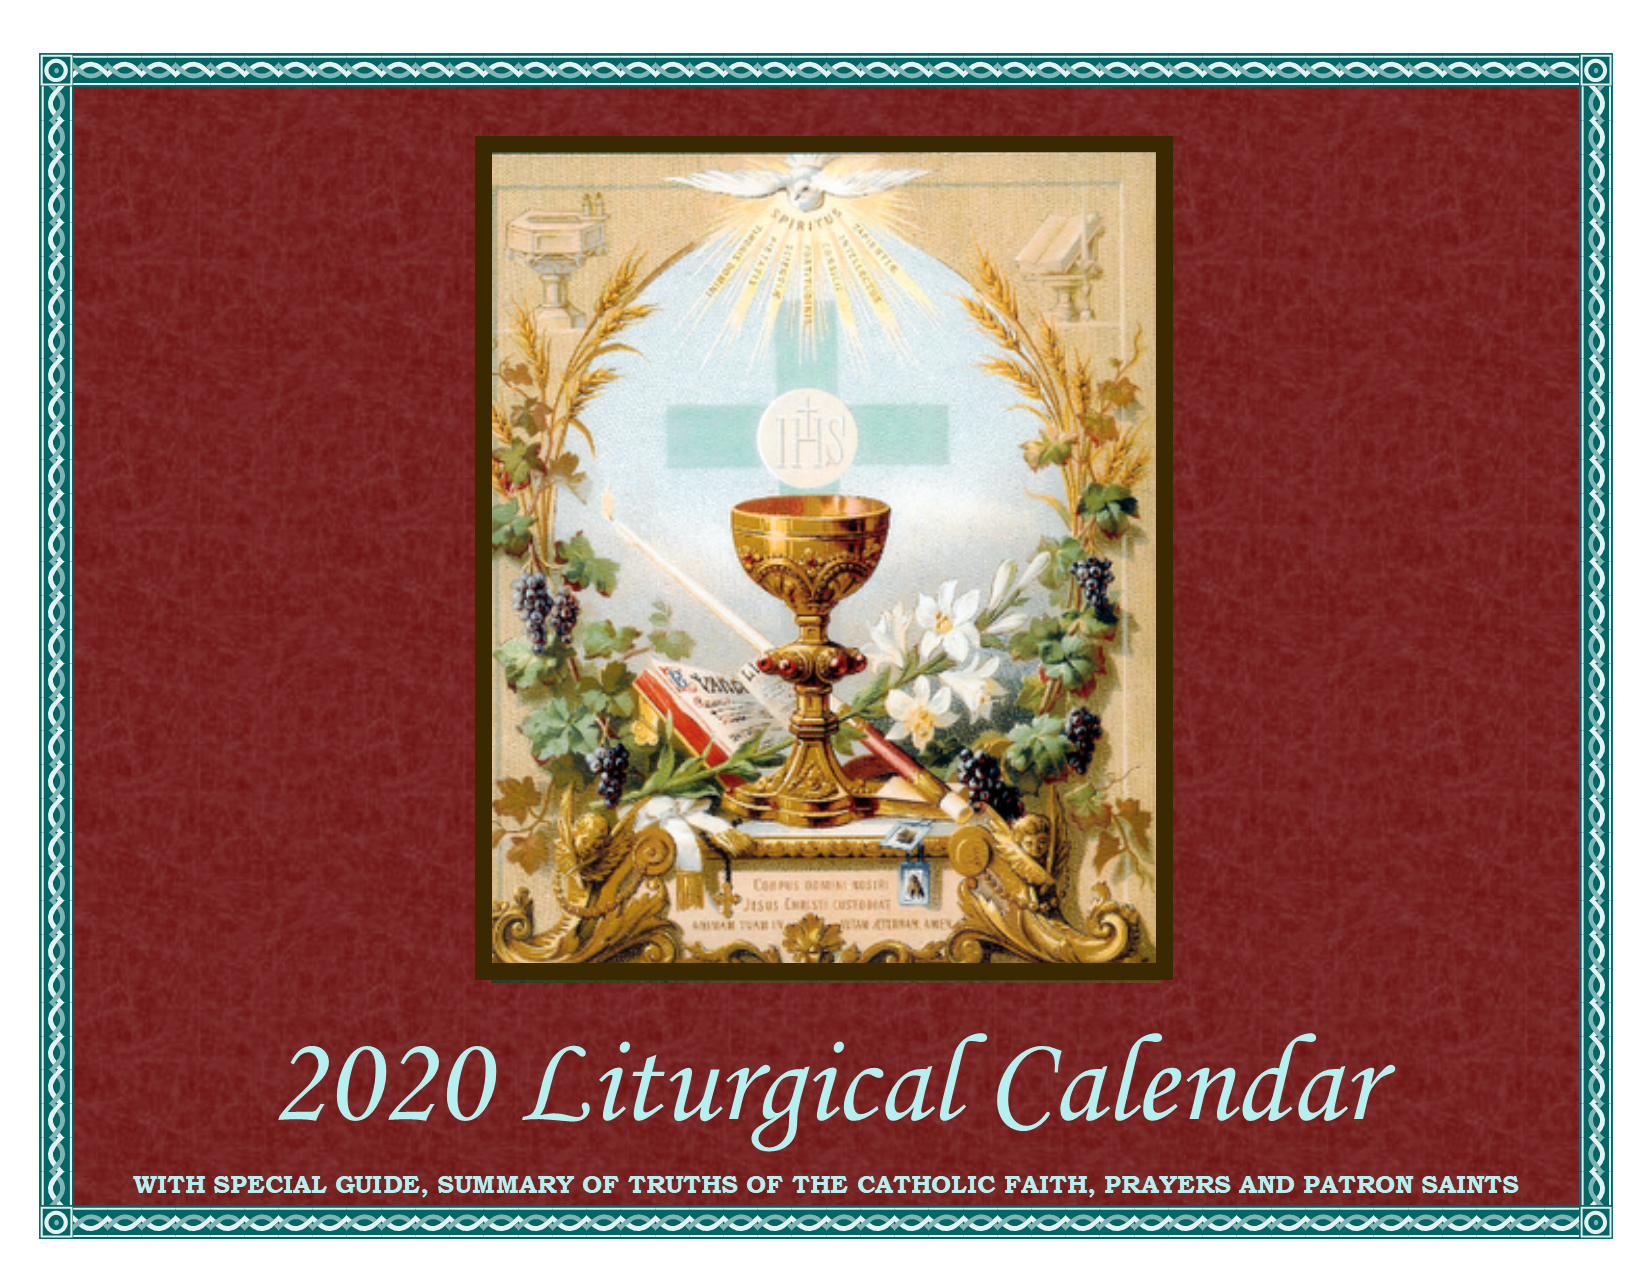 2020 - 2018 Liturgical Calendar 2020 Liturgical Calendar – Servi.org